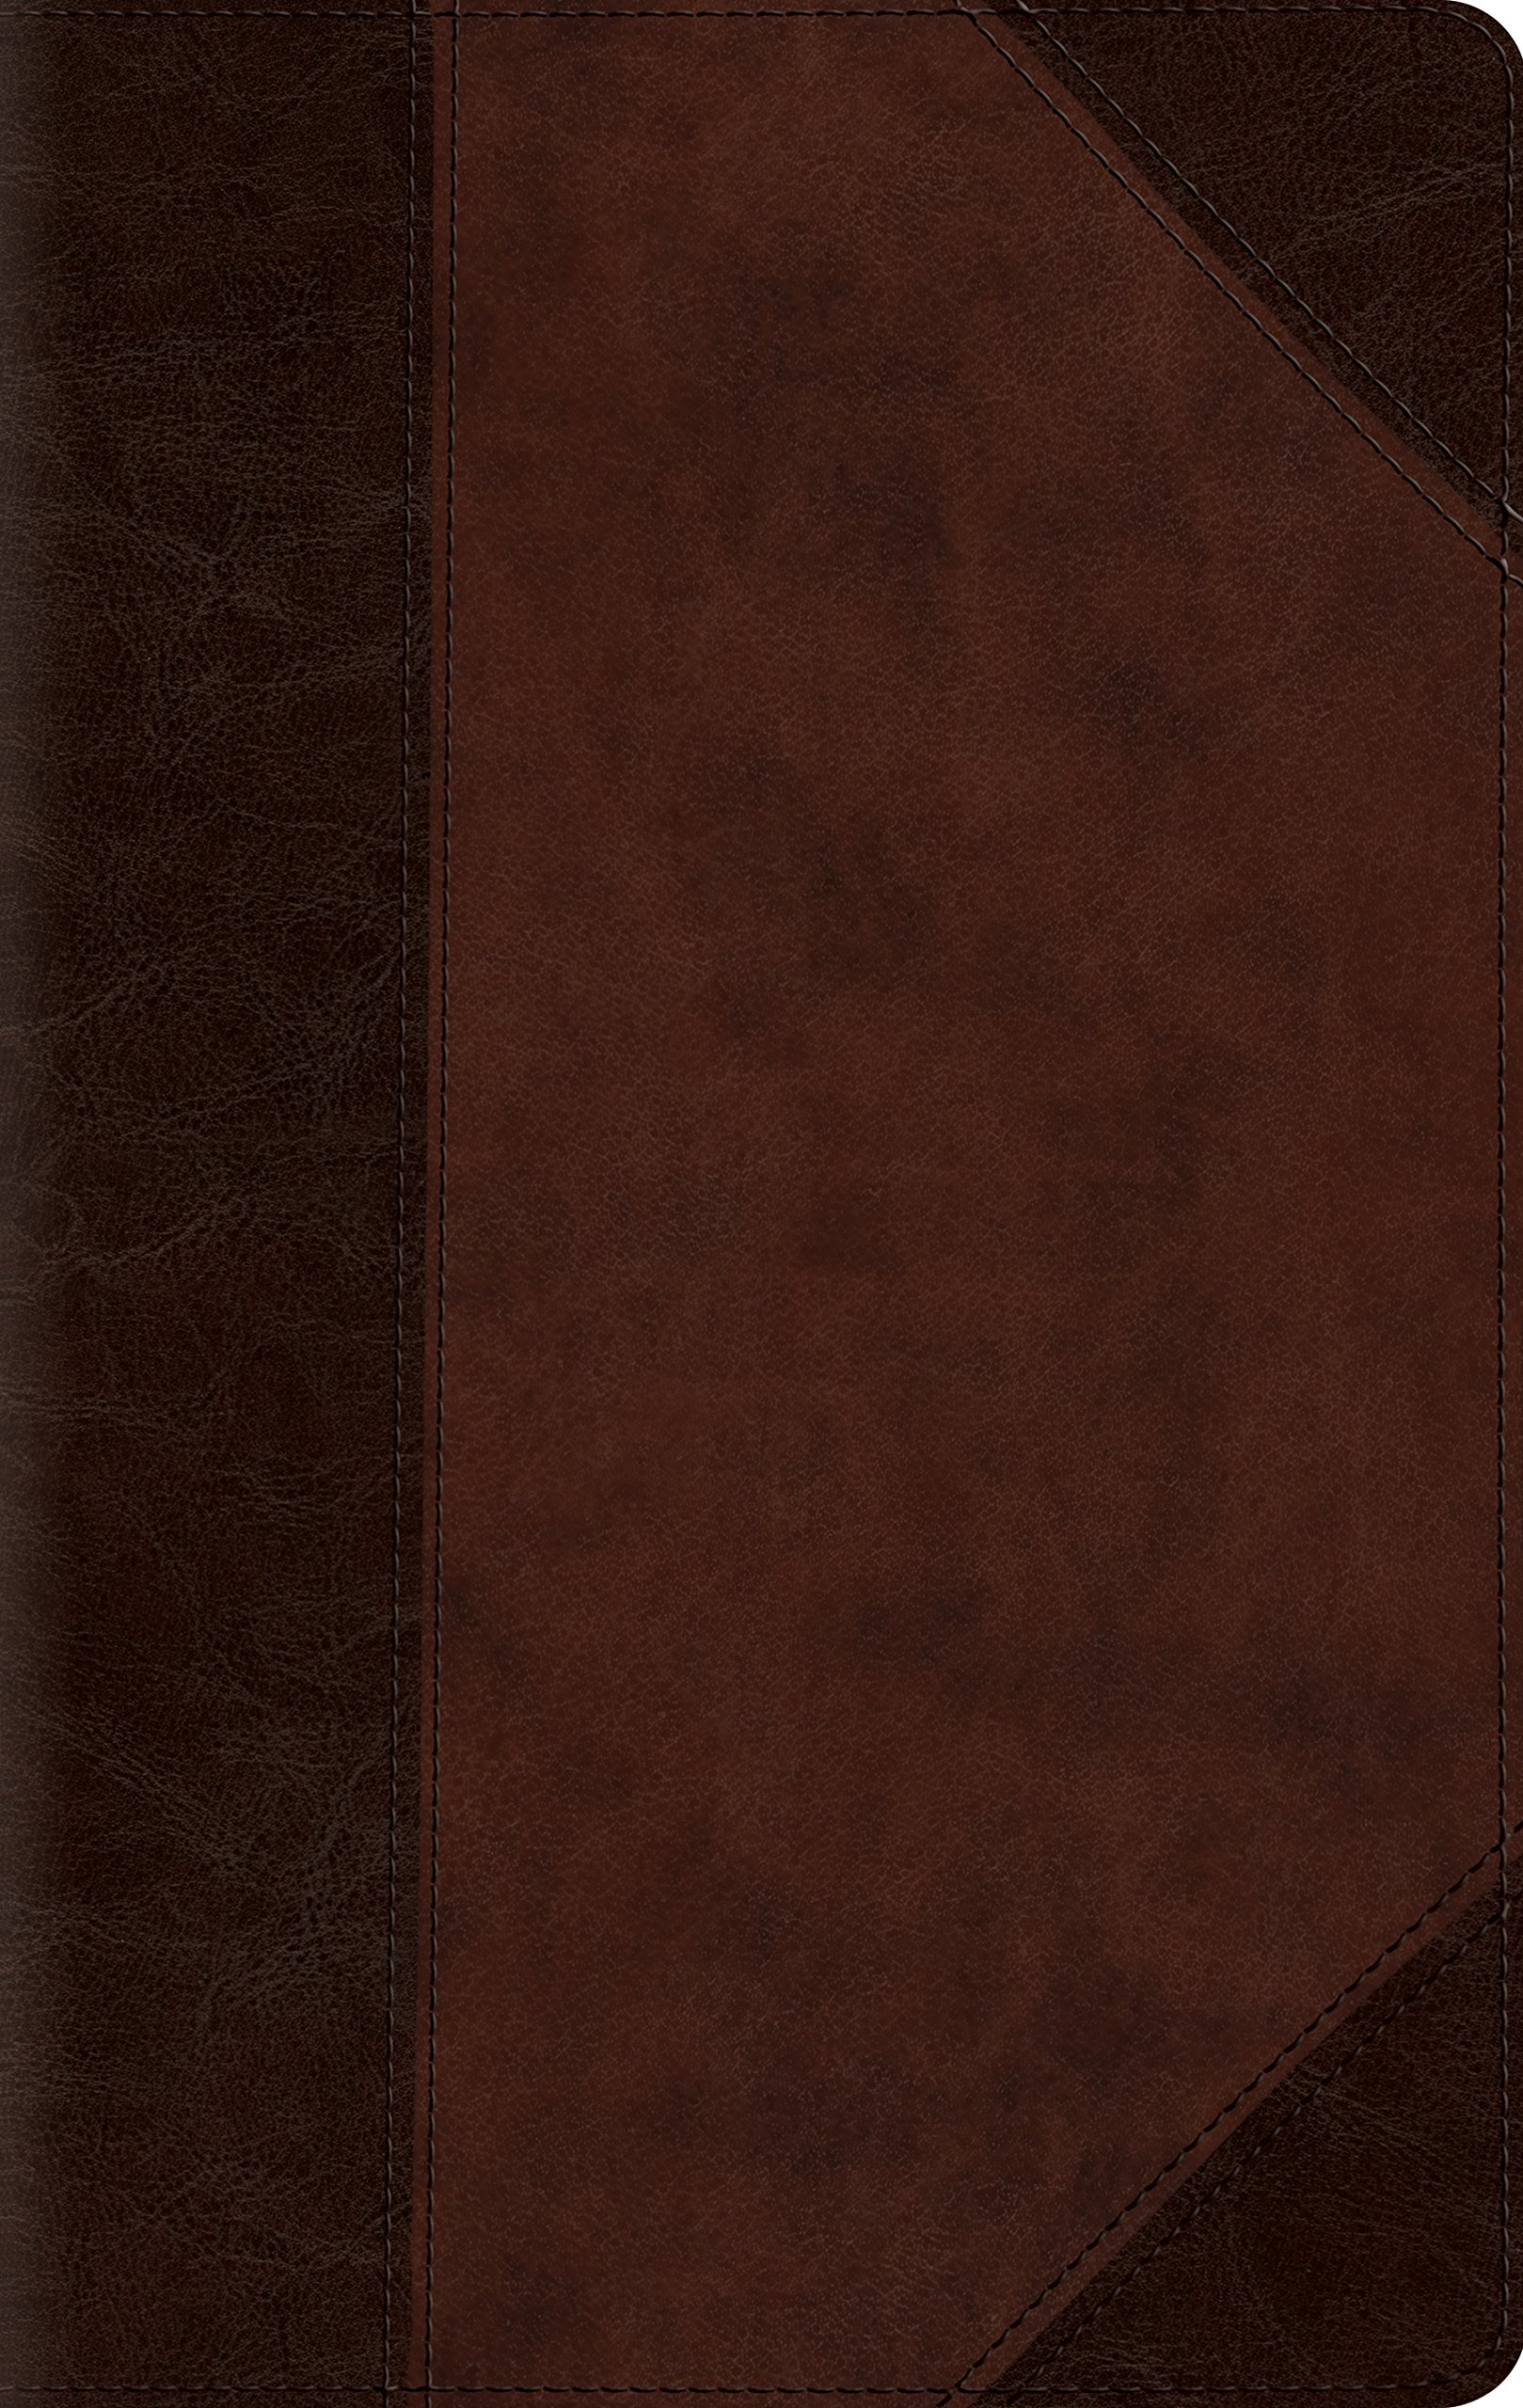 ESV Large Print Compact Bible (TruTone, Brown/Walnut